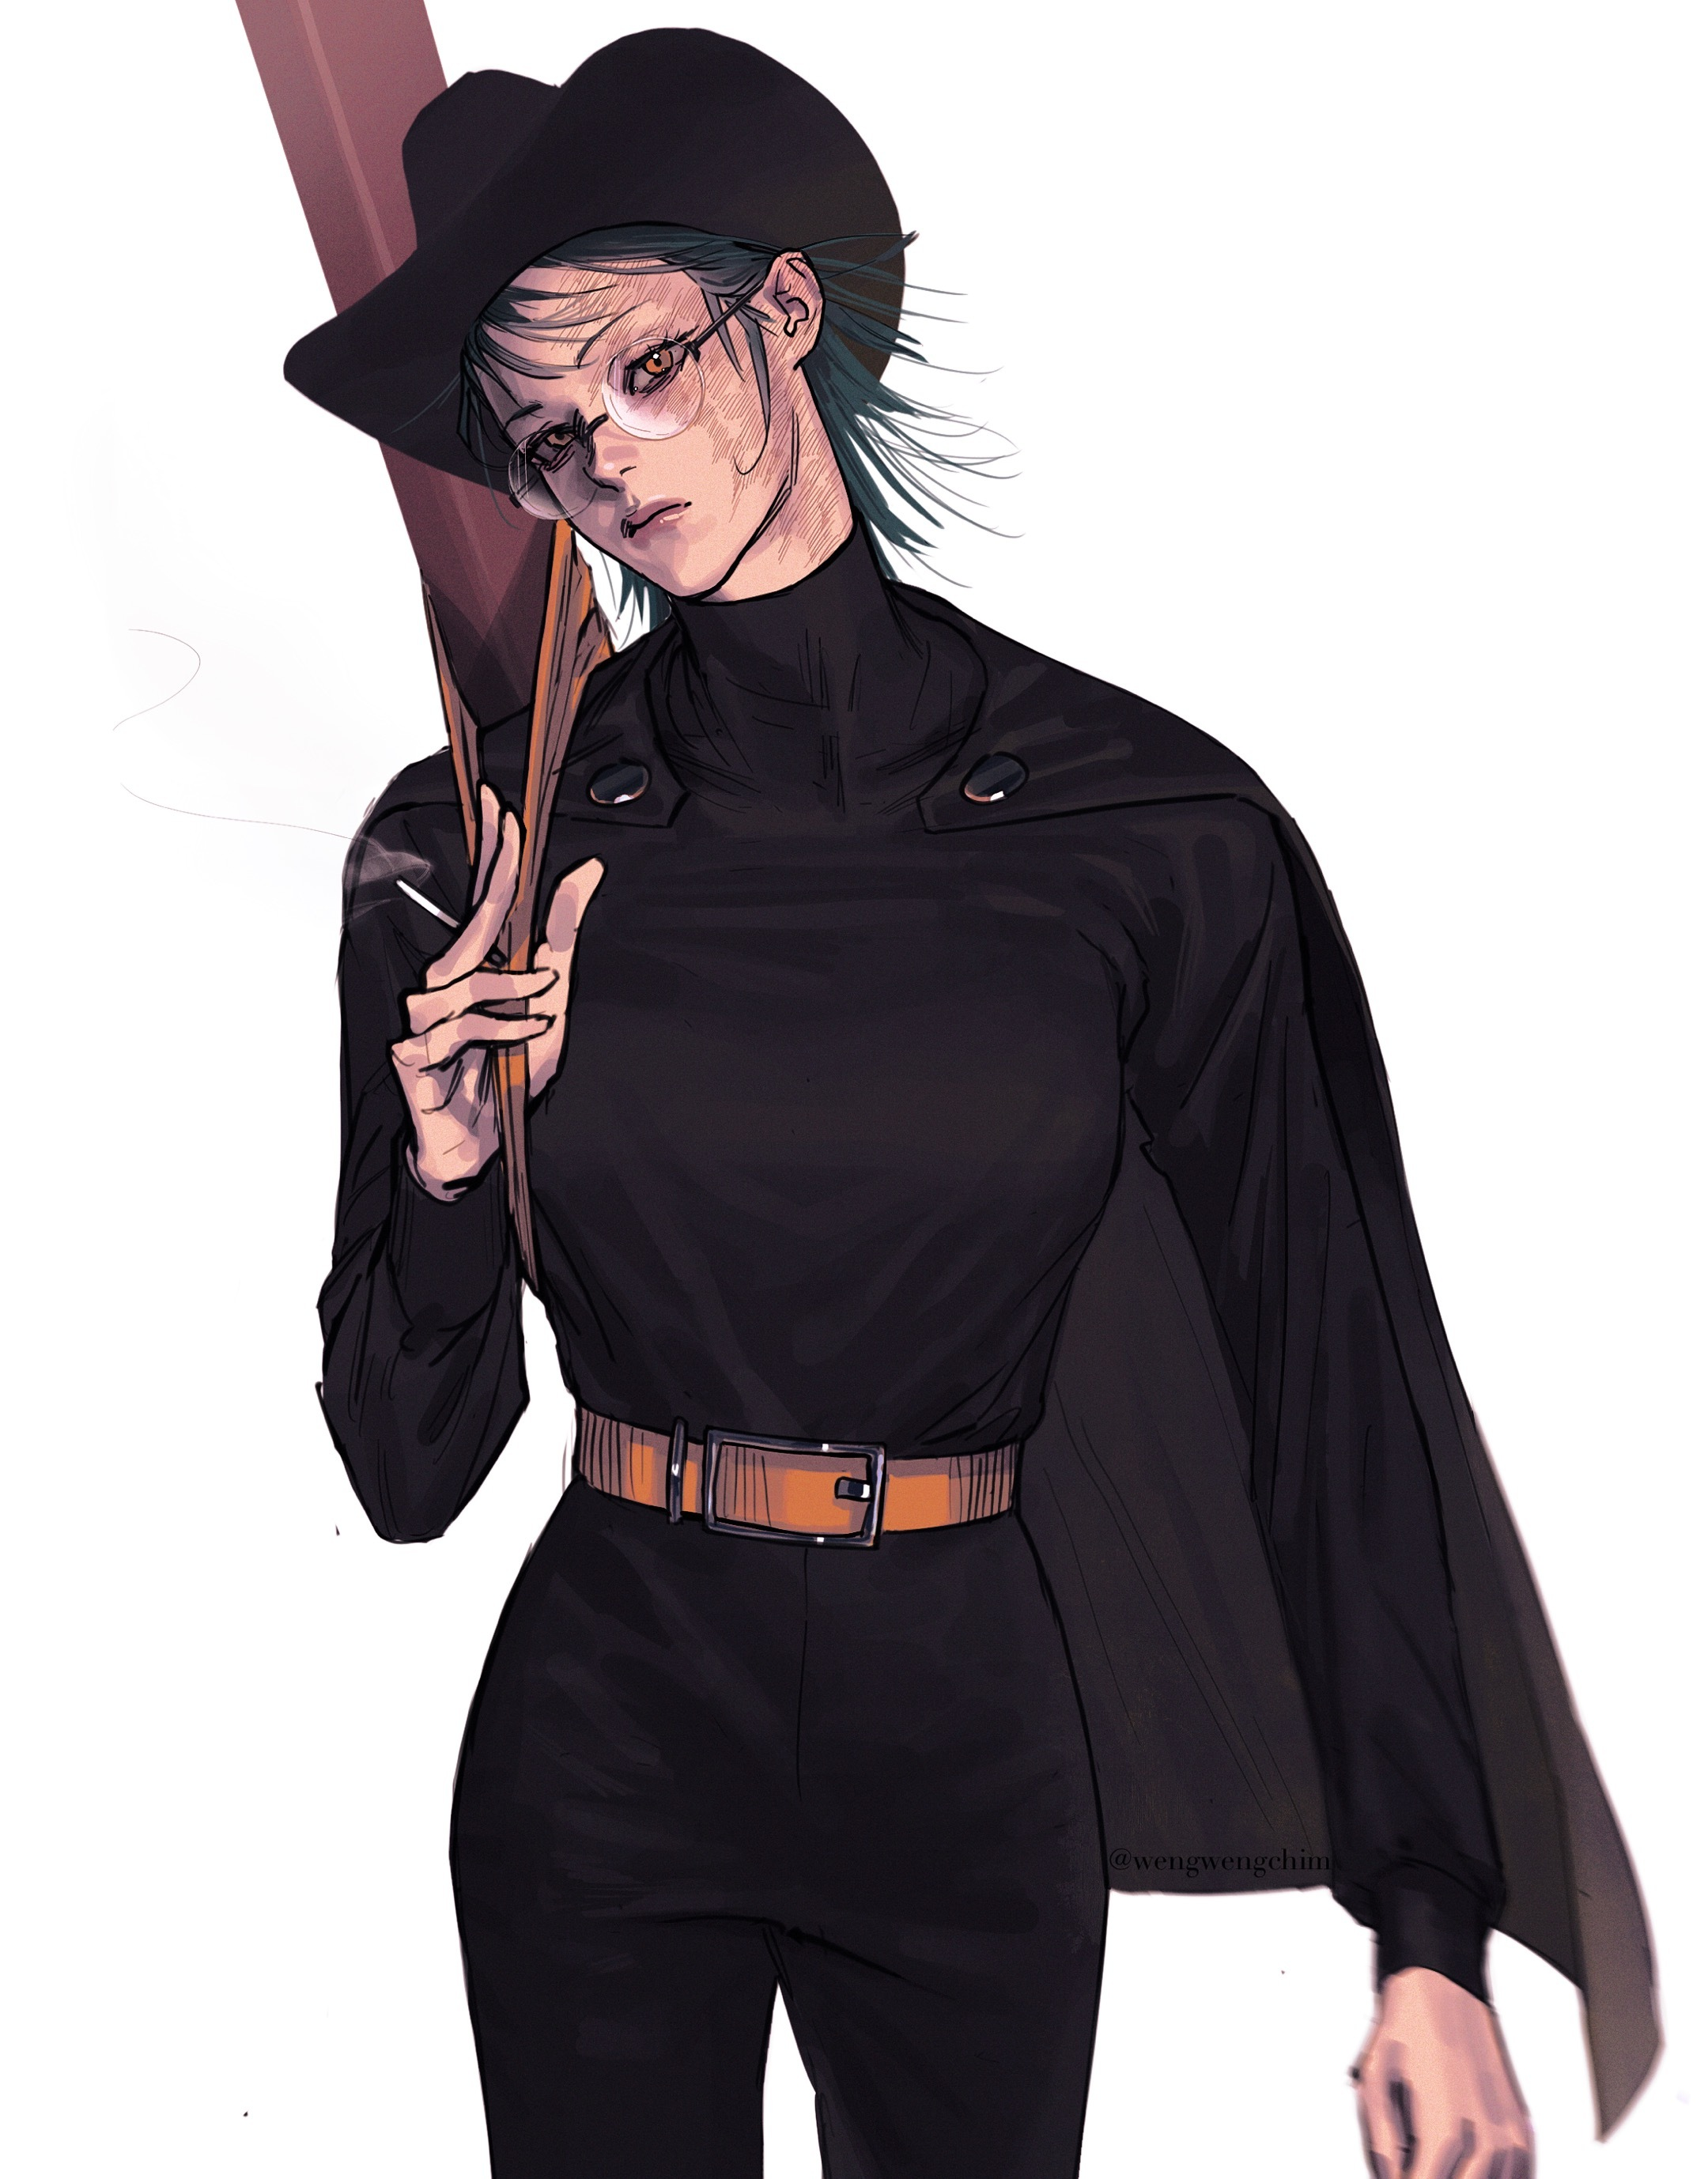 Zenin Maki Jujutsu Kaisen Image 3298723 Zerochan Anime Image Board